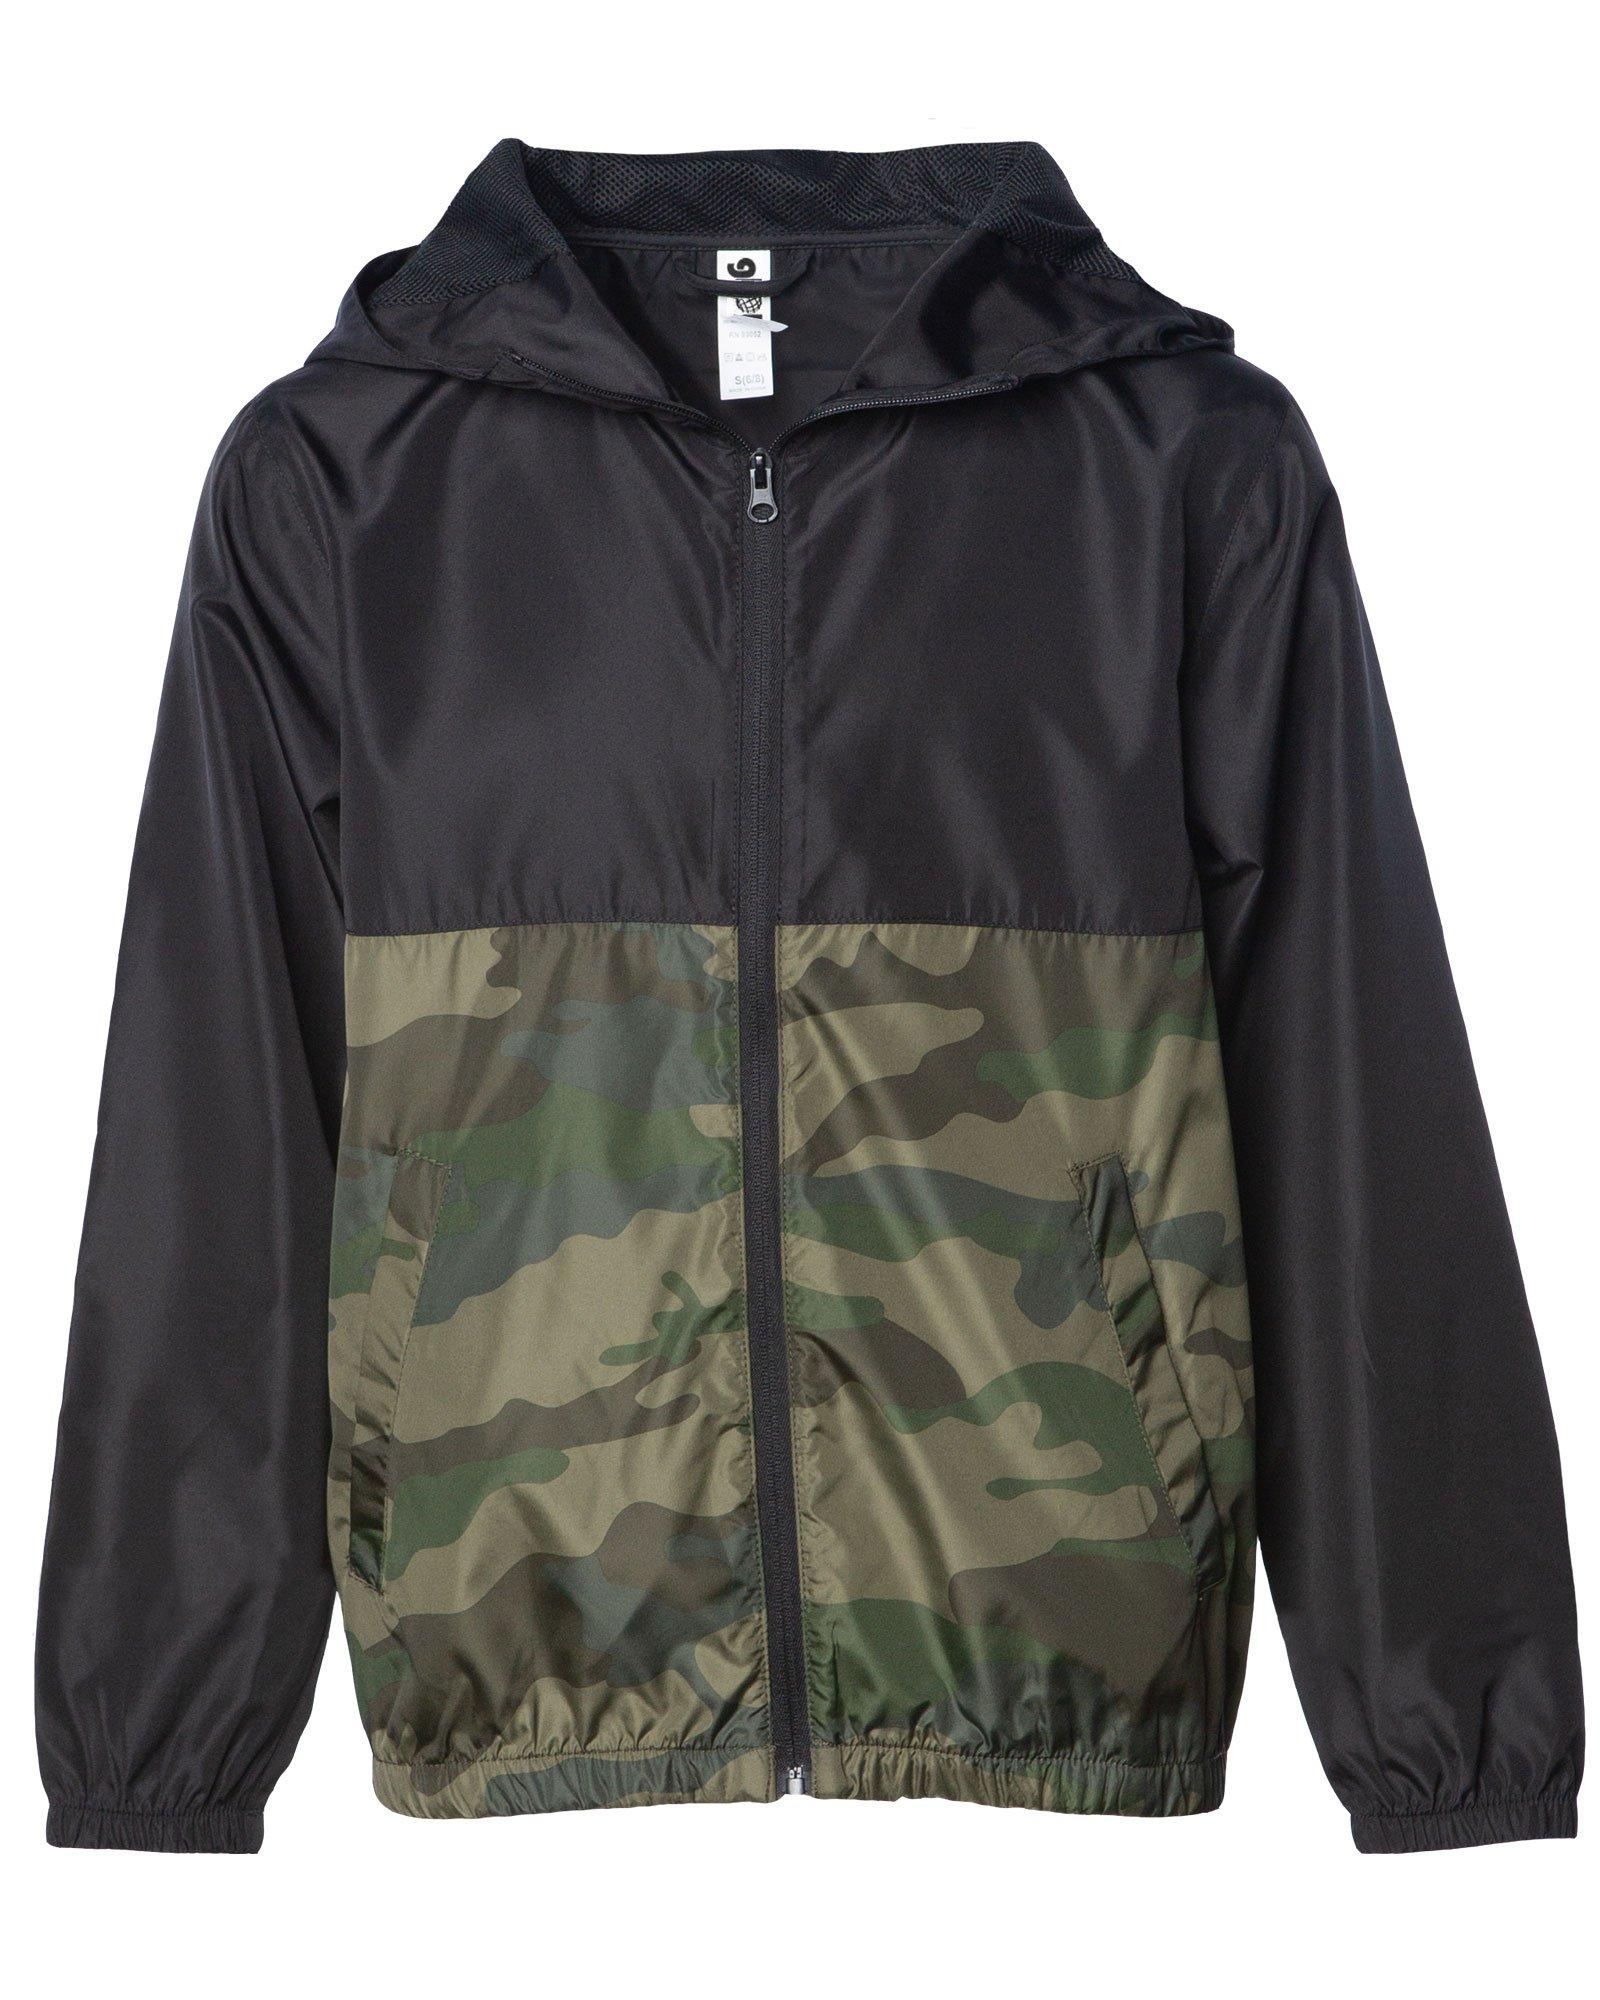 Global Kid's Hooded Lightweight Windbreaker Rain Jacket Water Resistant Shell (Medium, Black/Camo)